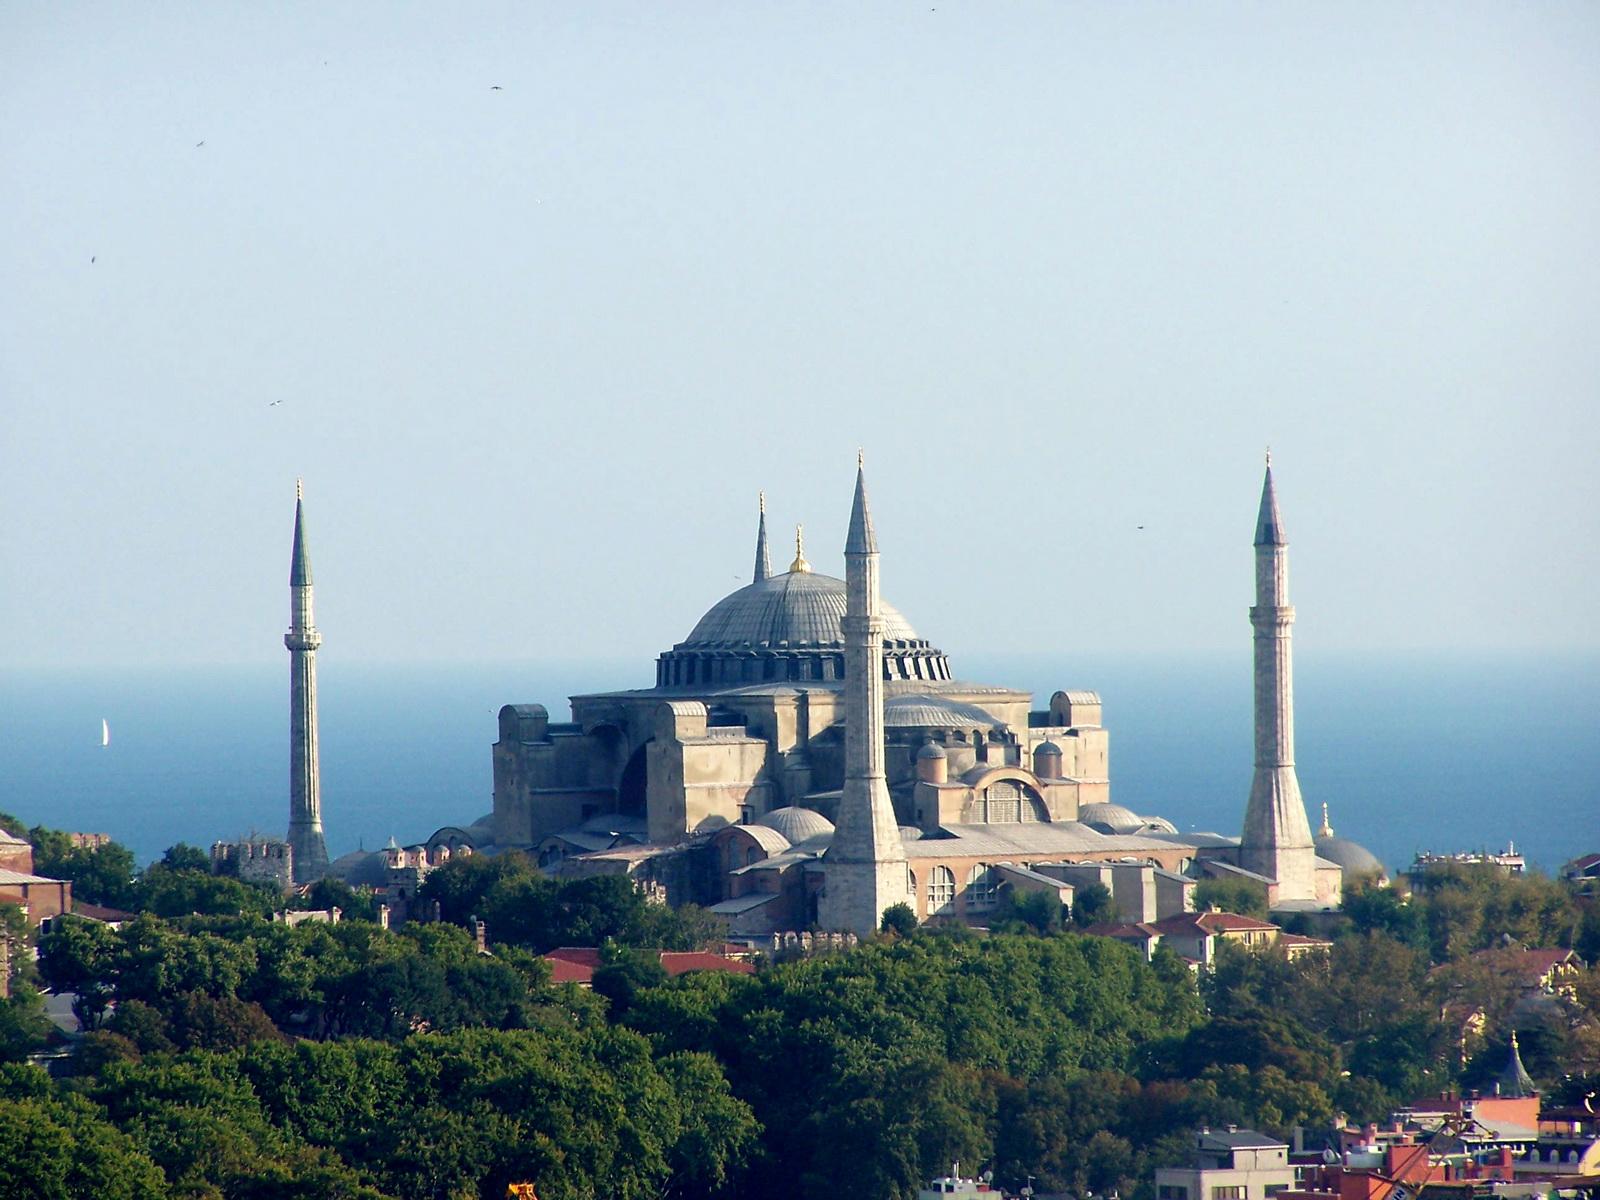 http://1.bp.blogspot.com/-BdqXr9dwjRs/UV6fCafQ_YI/AAAAAAAAClo/FHvYqrQ93lI/s1600/Sultan+Ahmed+Mosque+in+Istanbul+(1).jpg